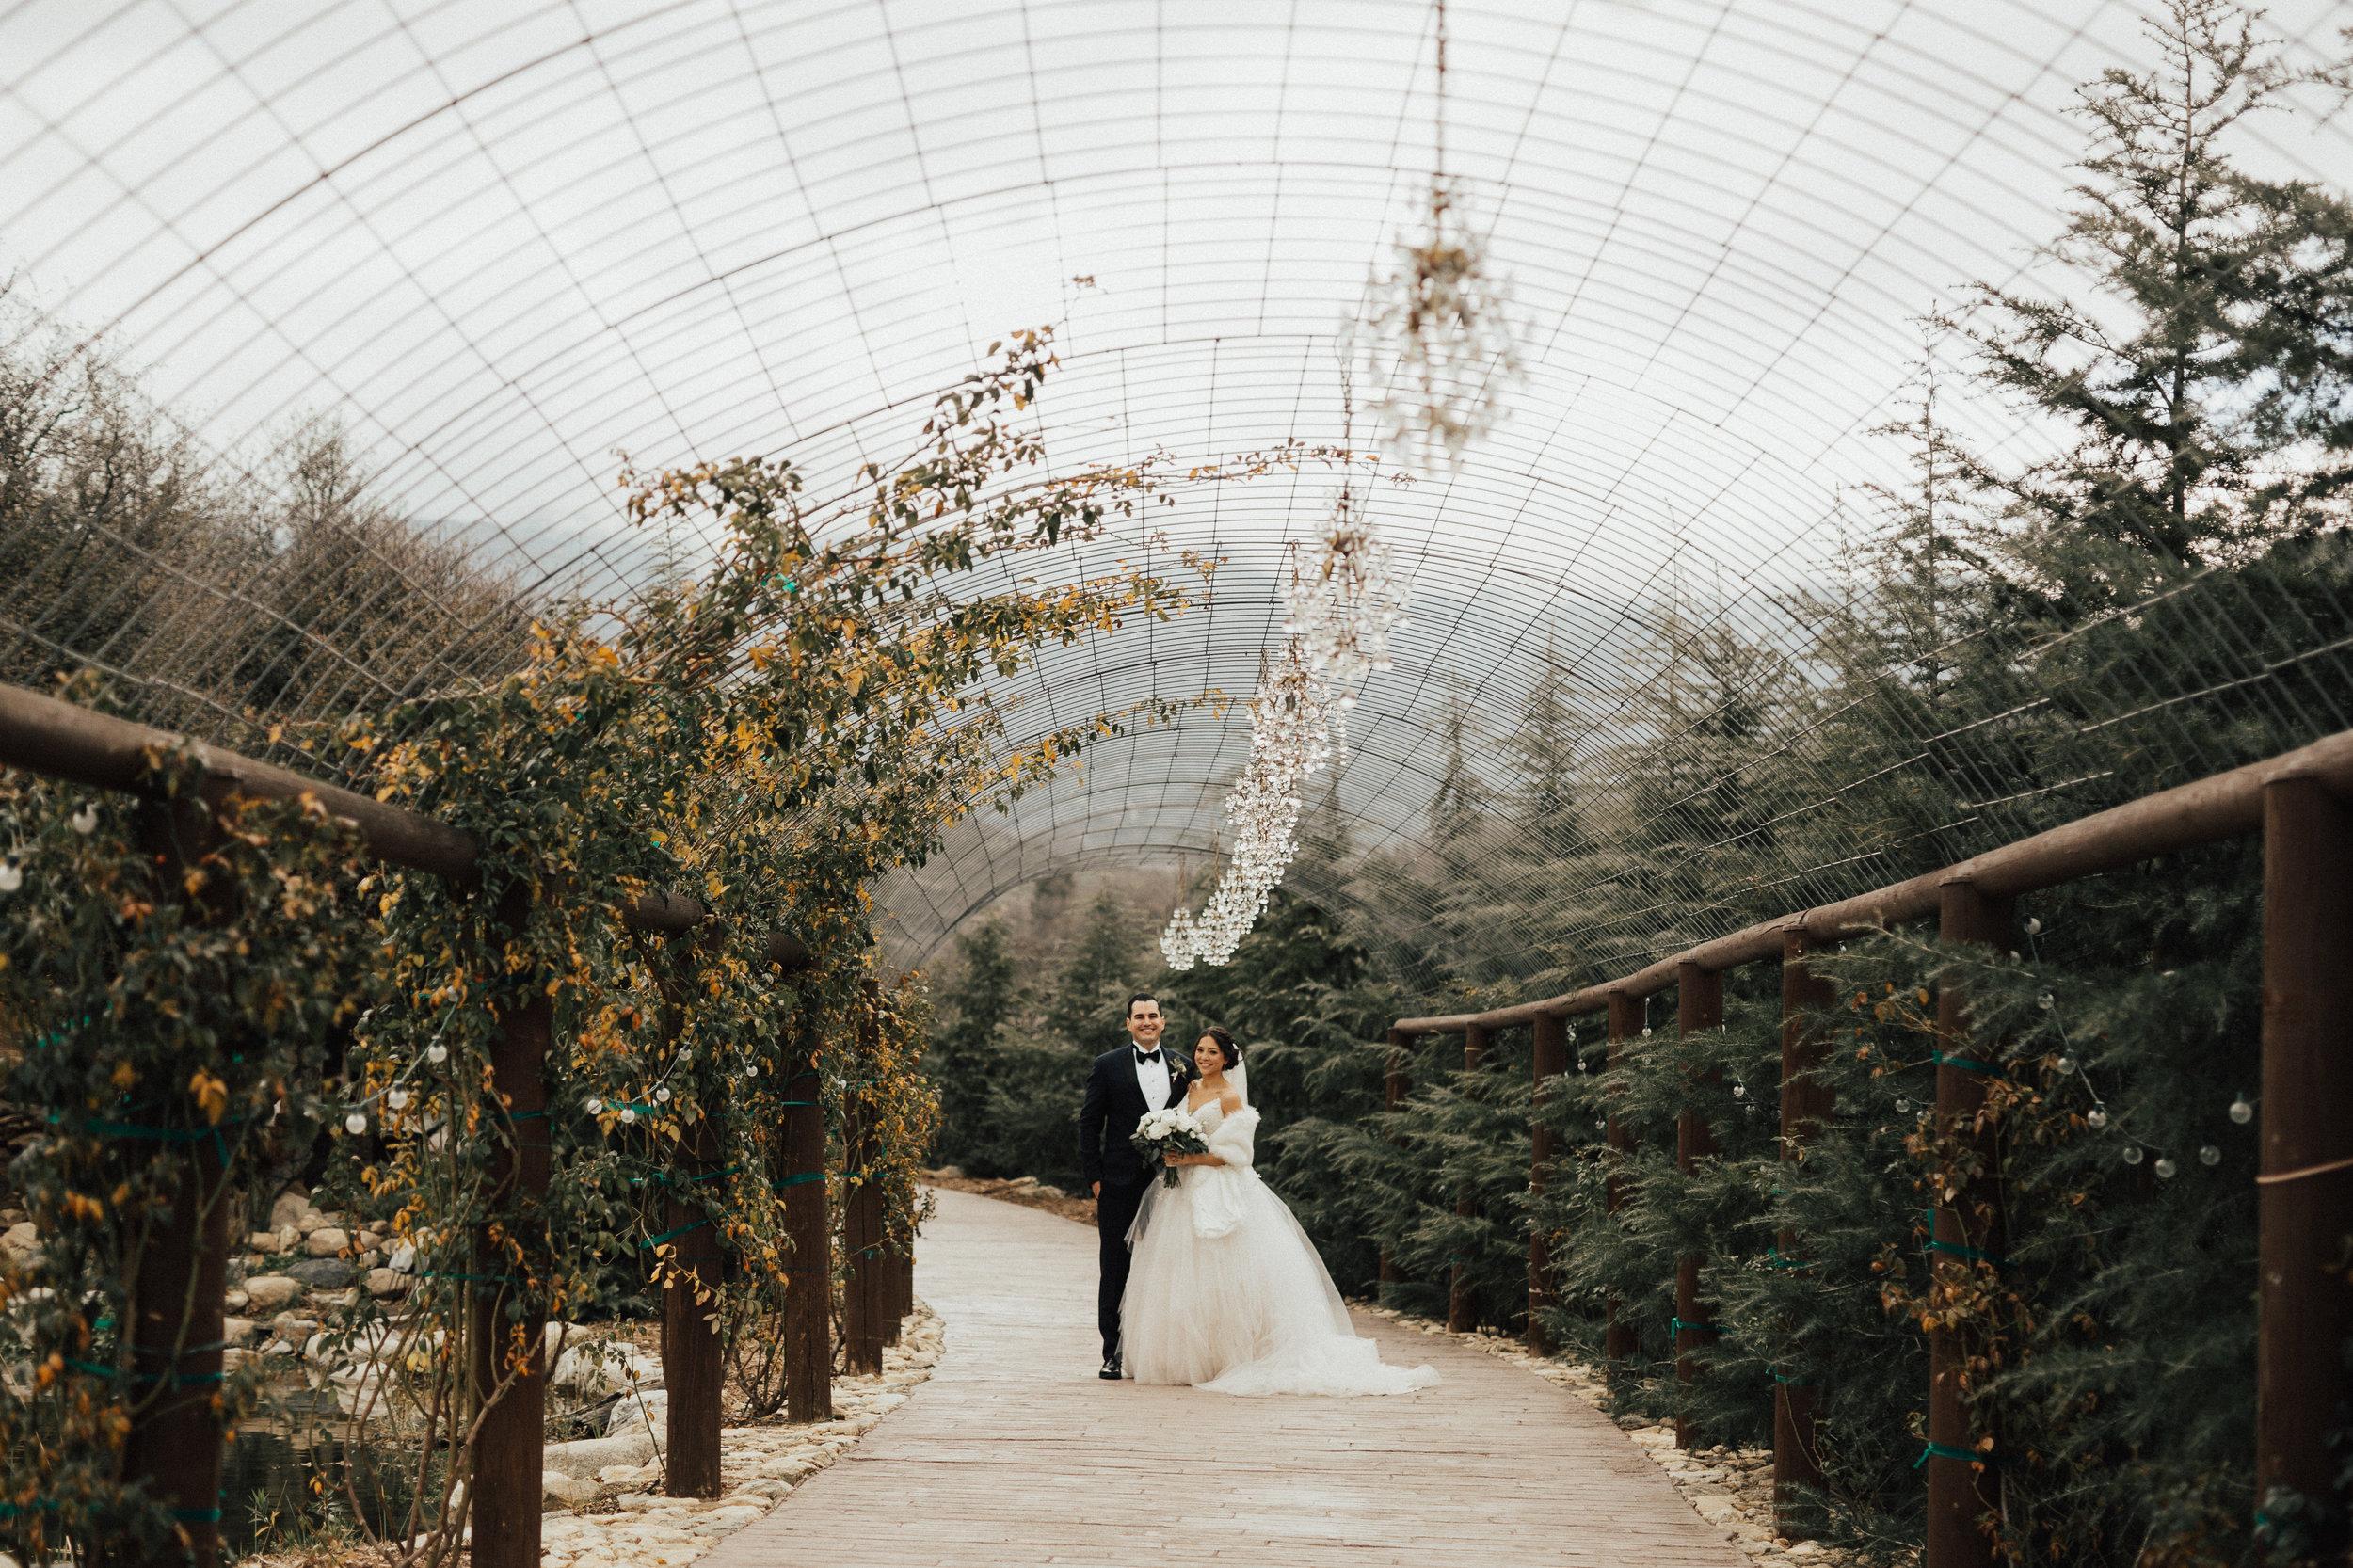 Glen Oak Wedding at Serendipity Gardens